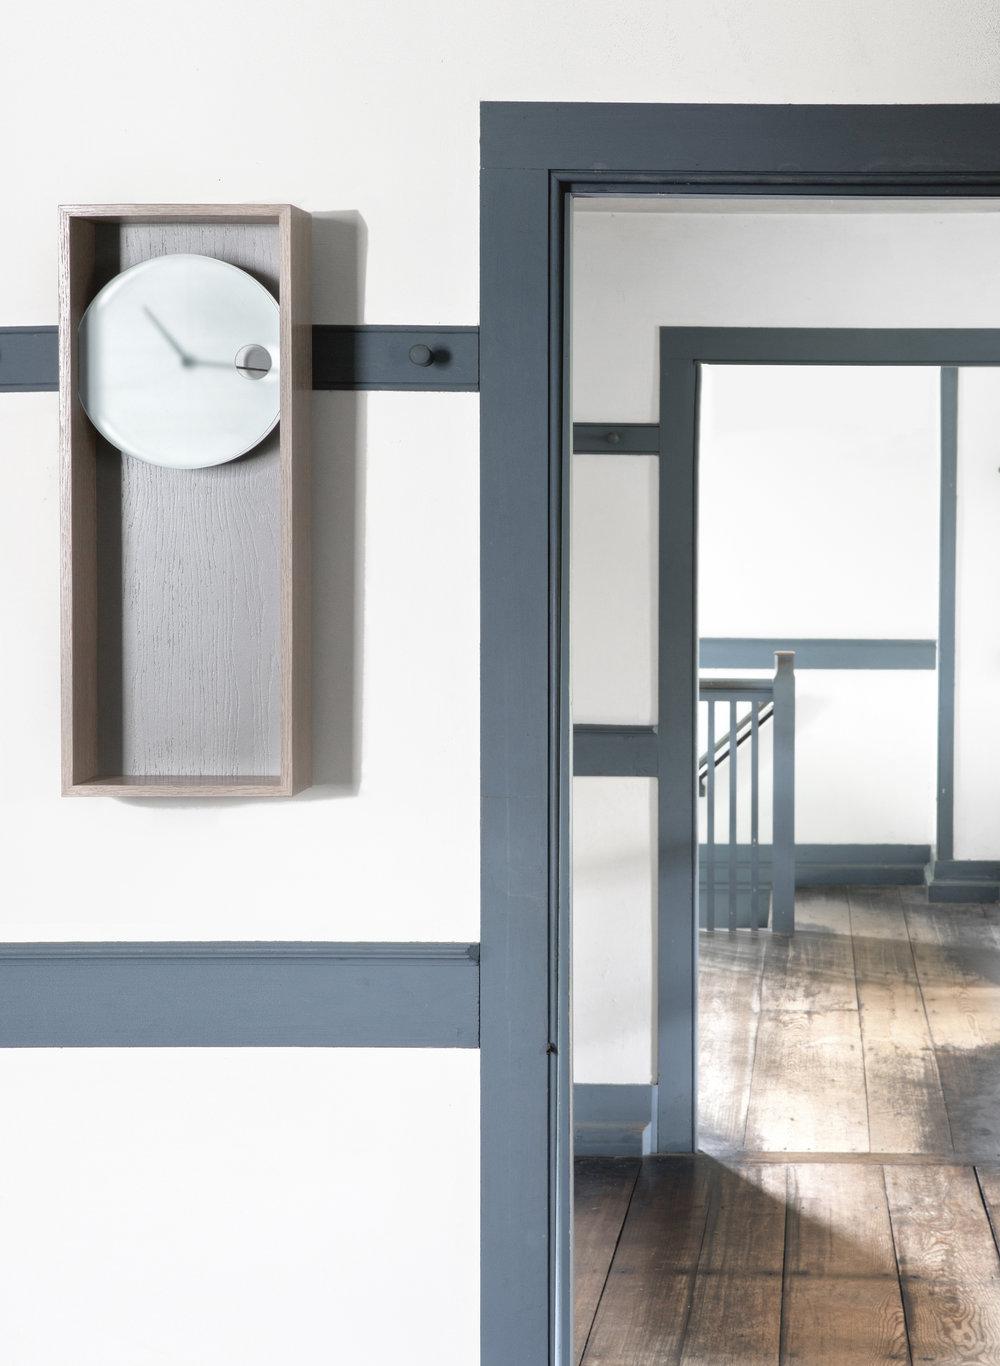 L&G clock 1.jpg